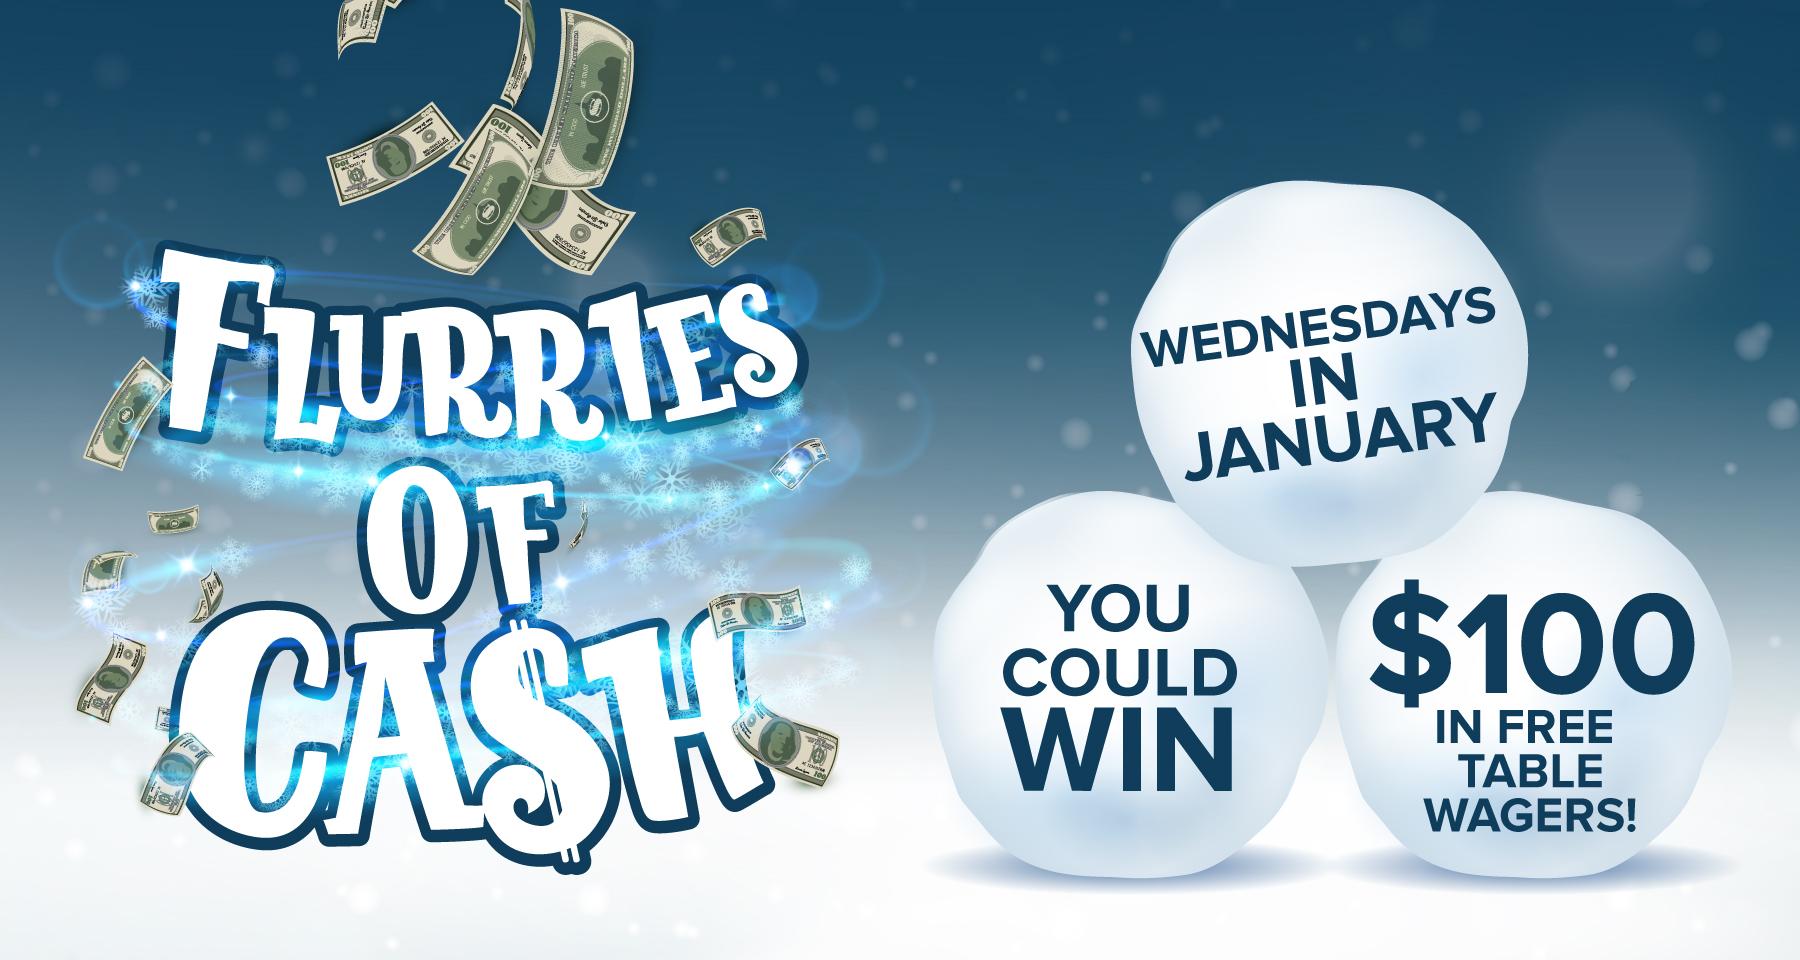 Flurries of Cash